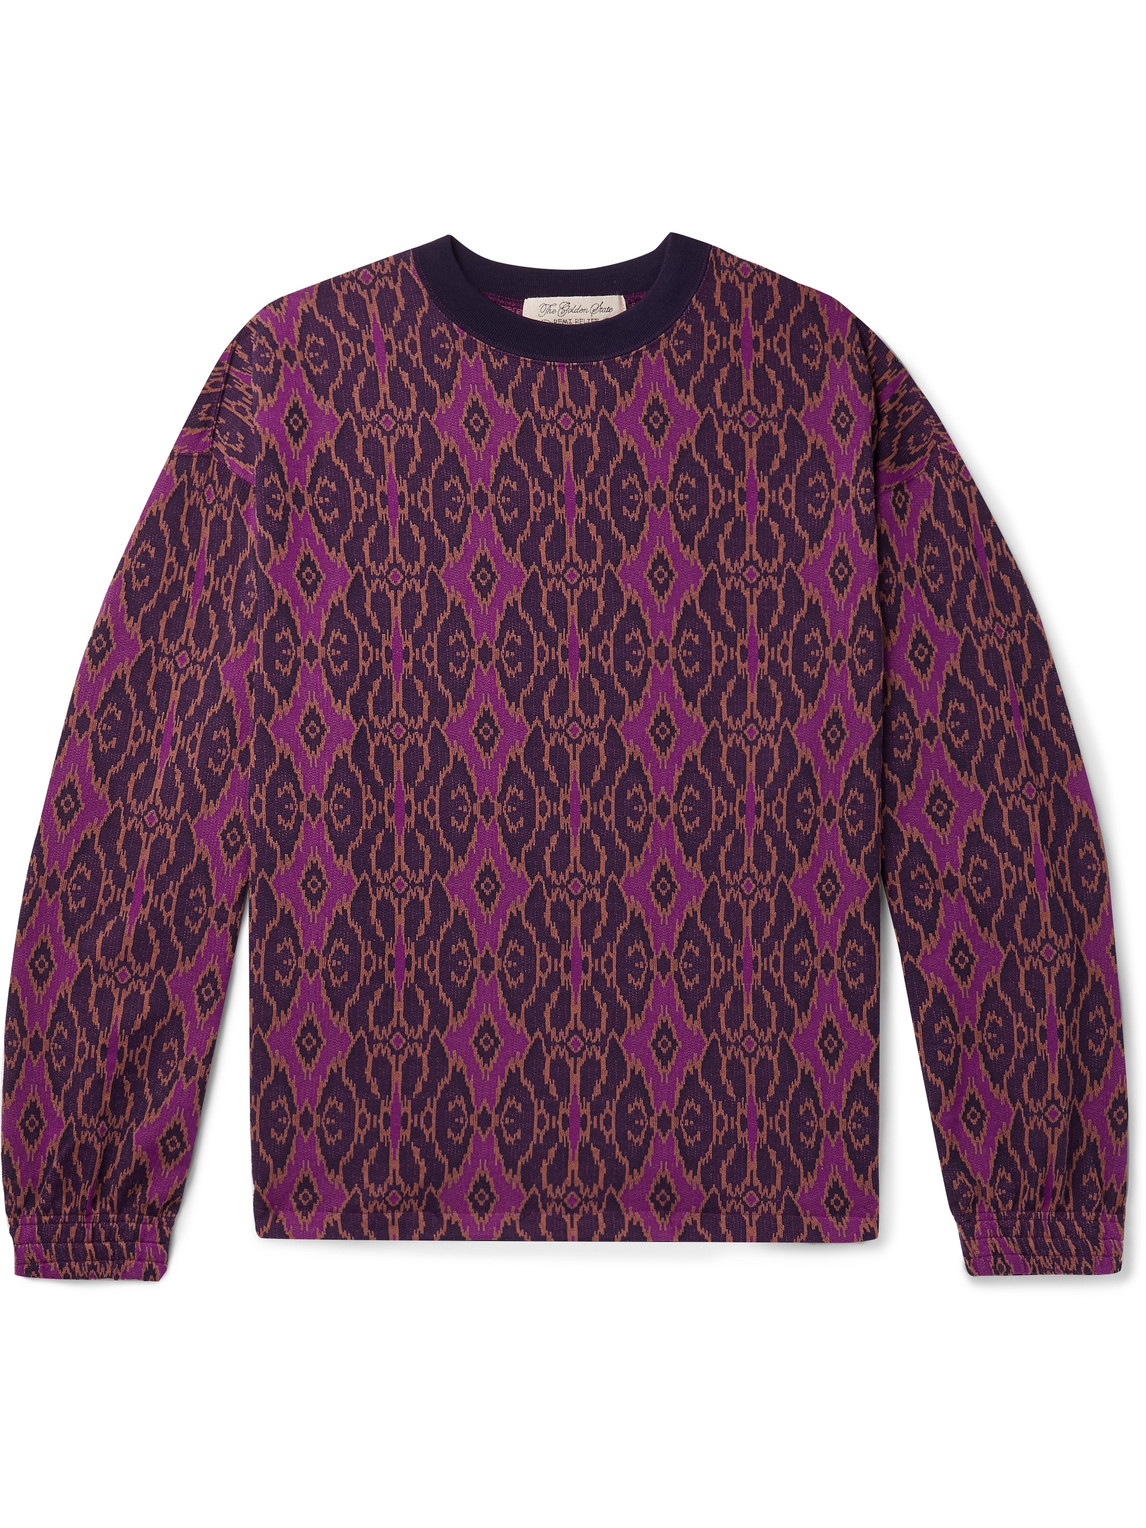 remi relief - jacquard-knit sweatshirt - men - purple - m